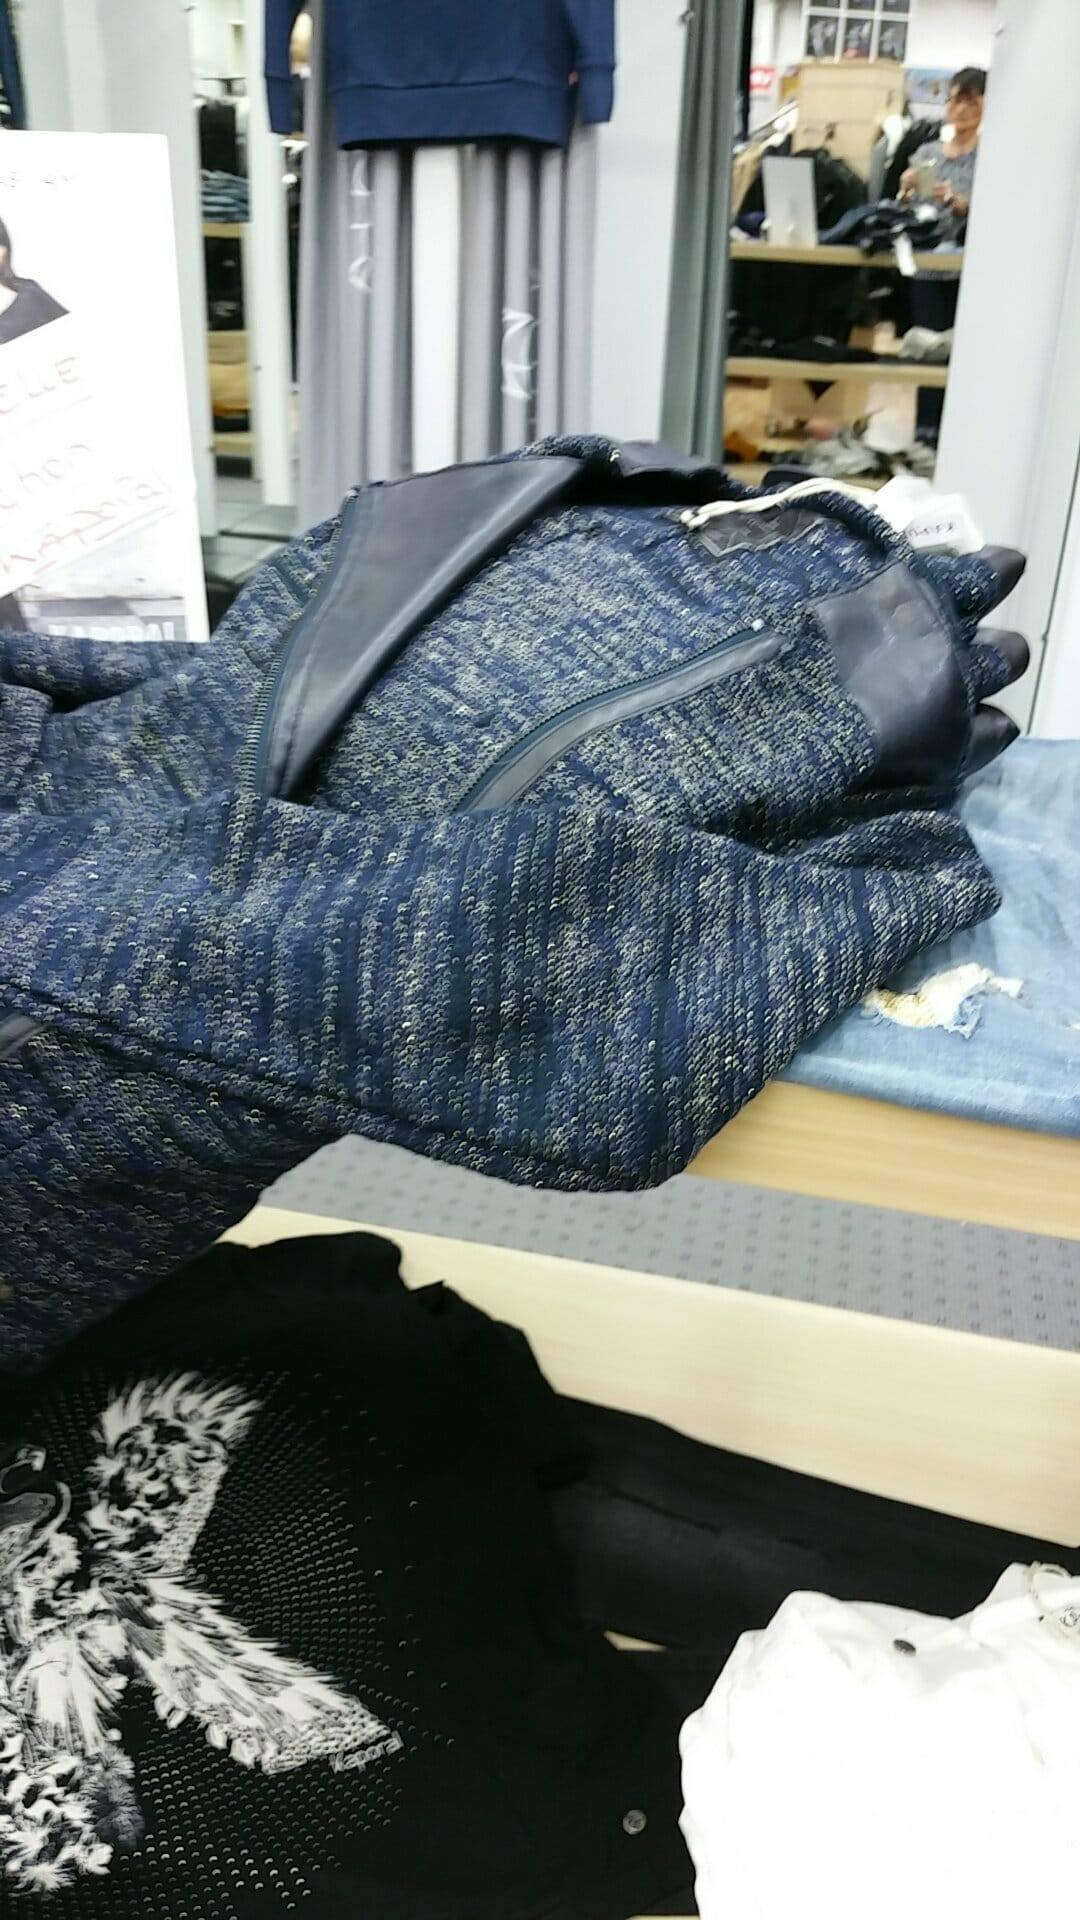 vetements homme femme jeans levis kaporal lee cooper